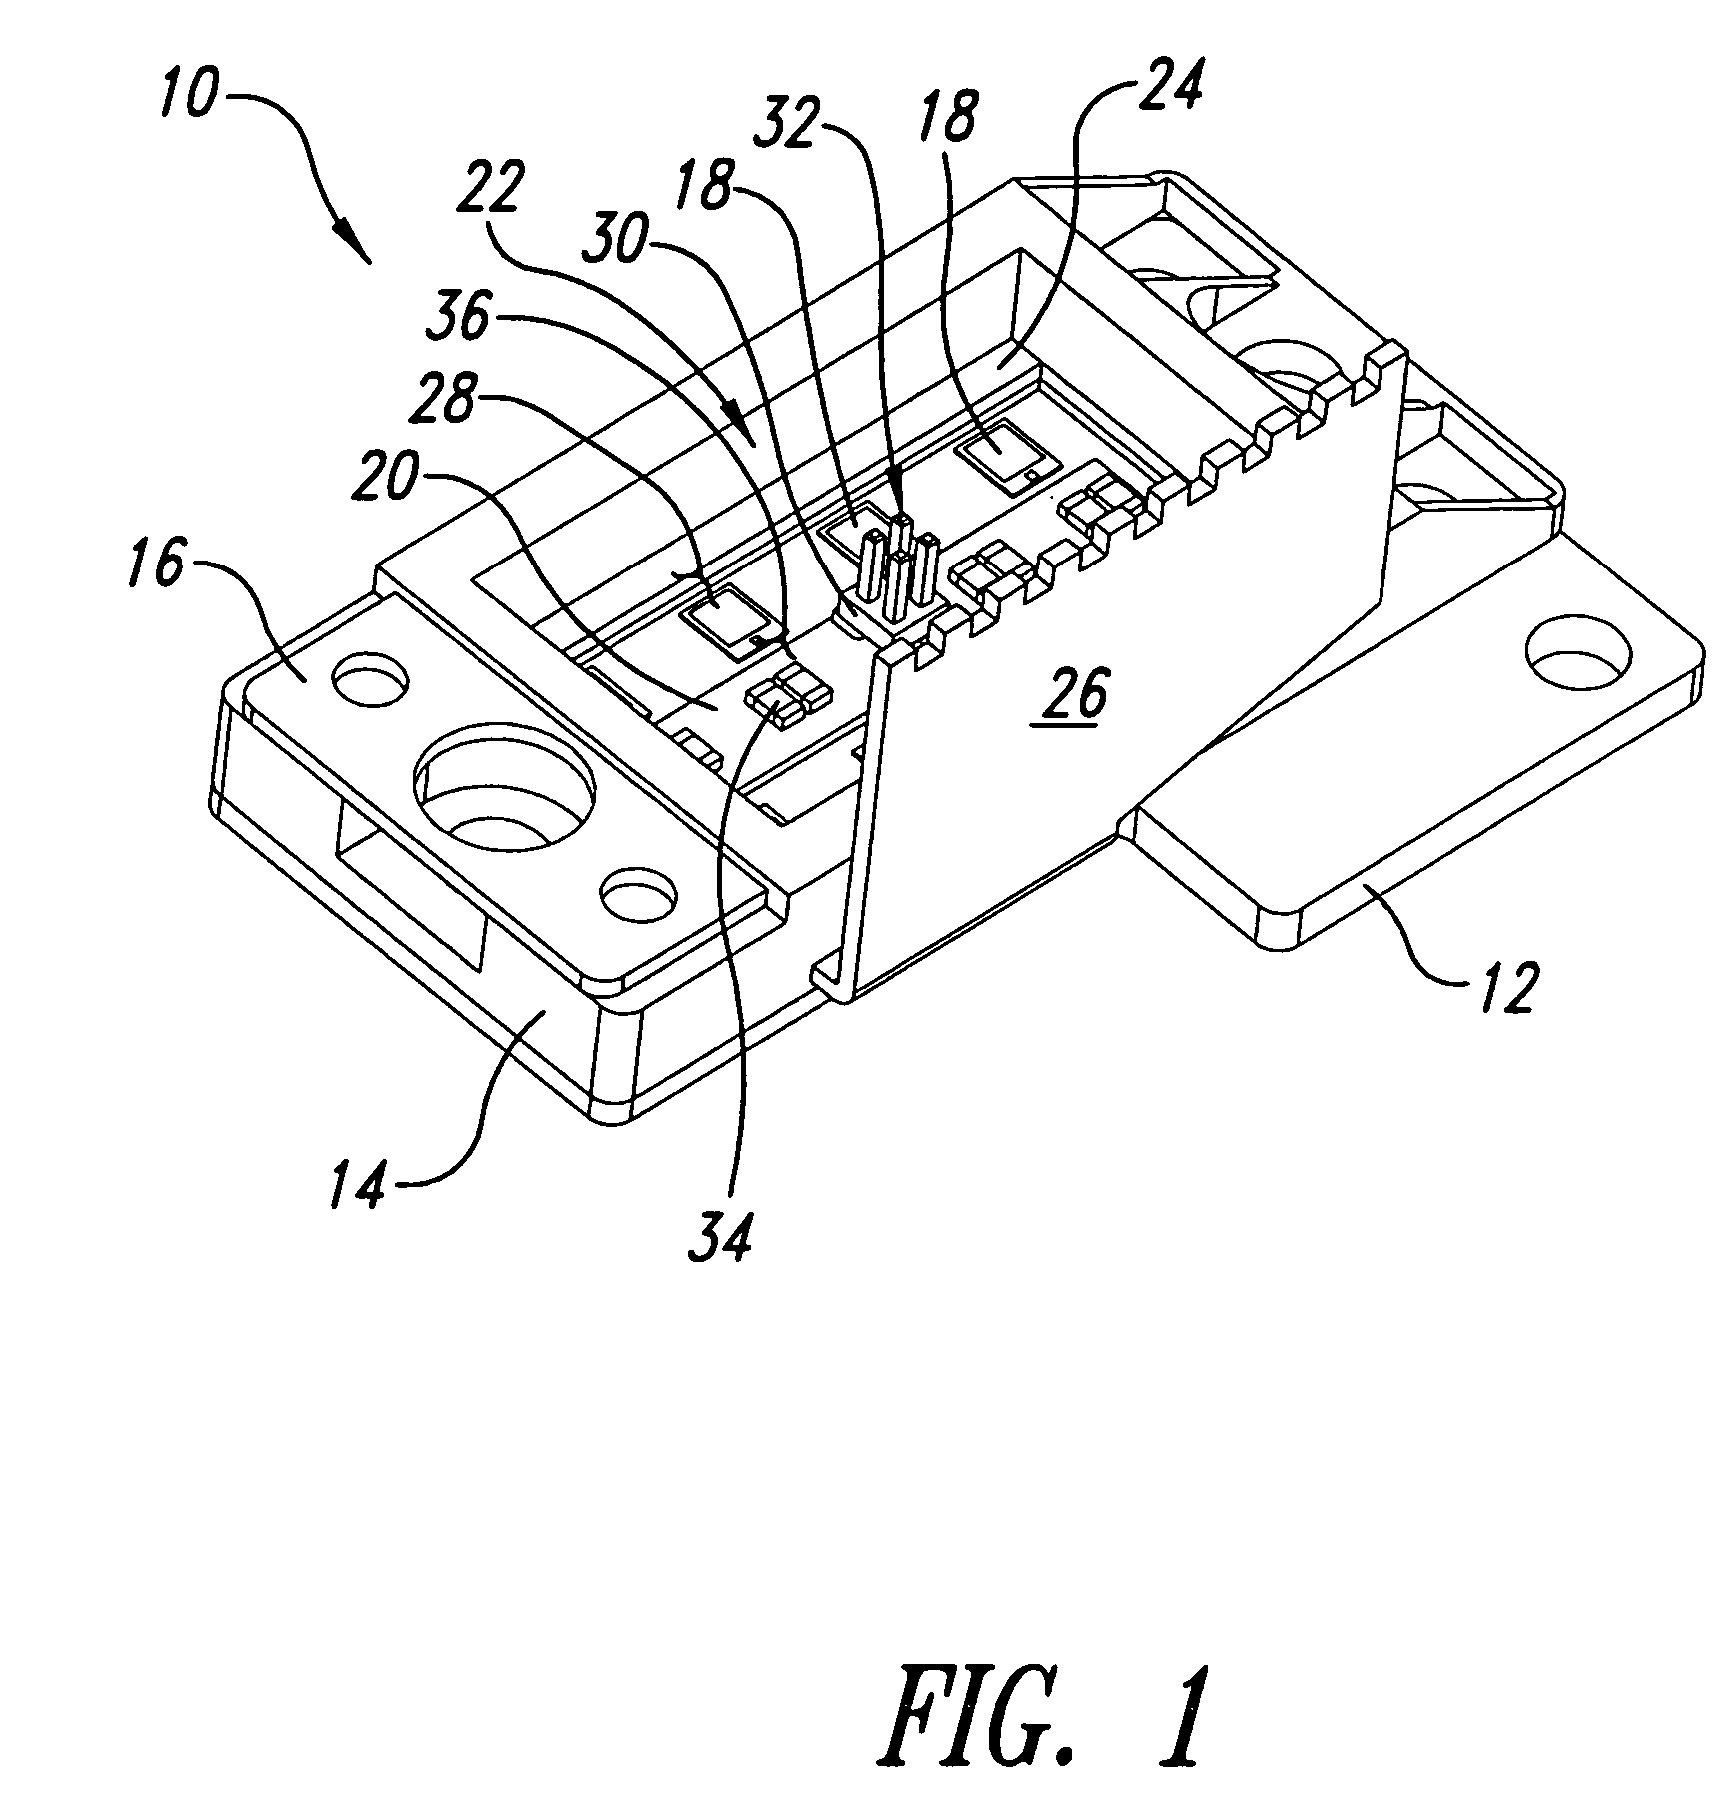 3 way switch wiring diagram multiple lights pdf wirdig wiring diagram